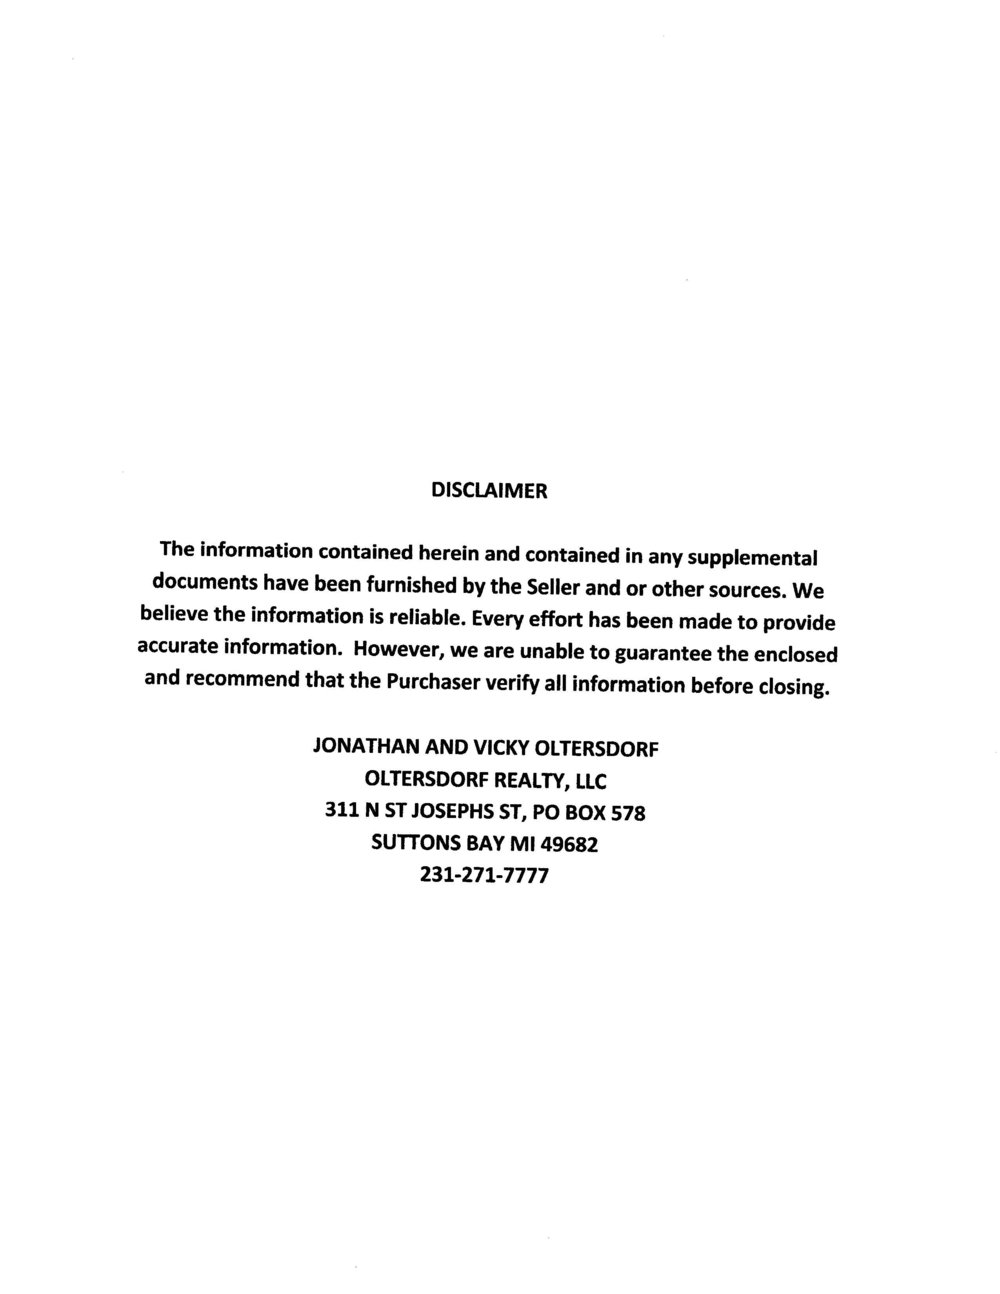 5544 E Kabat Road , Cedar - Marketing Packet for sale by Oltersdorf Realty LLC (24).jpg